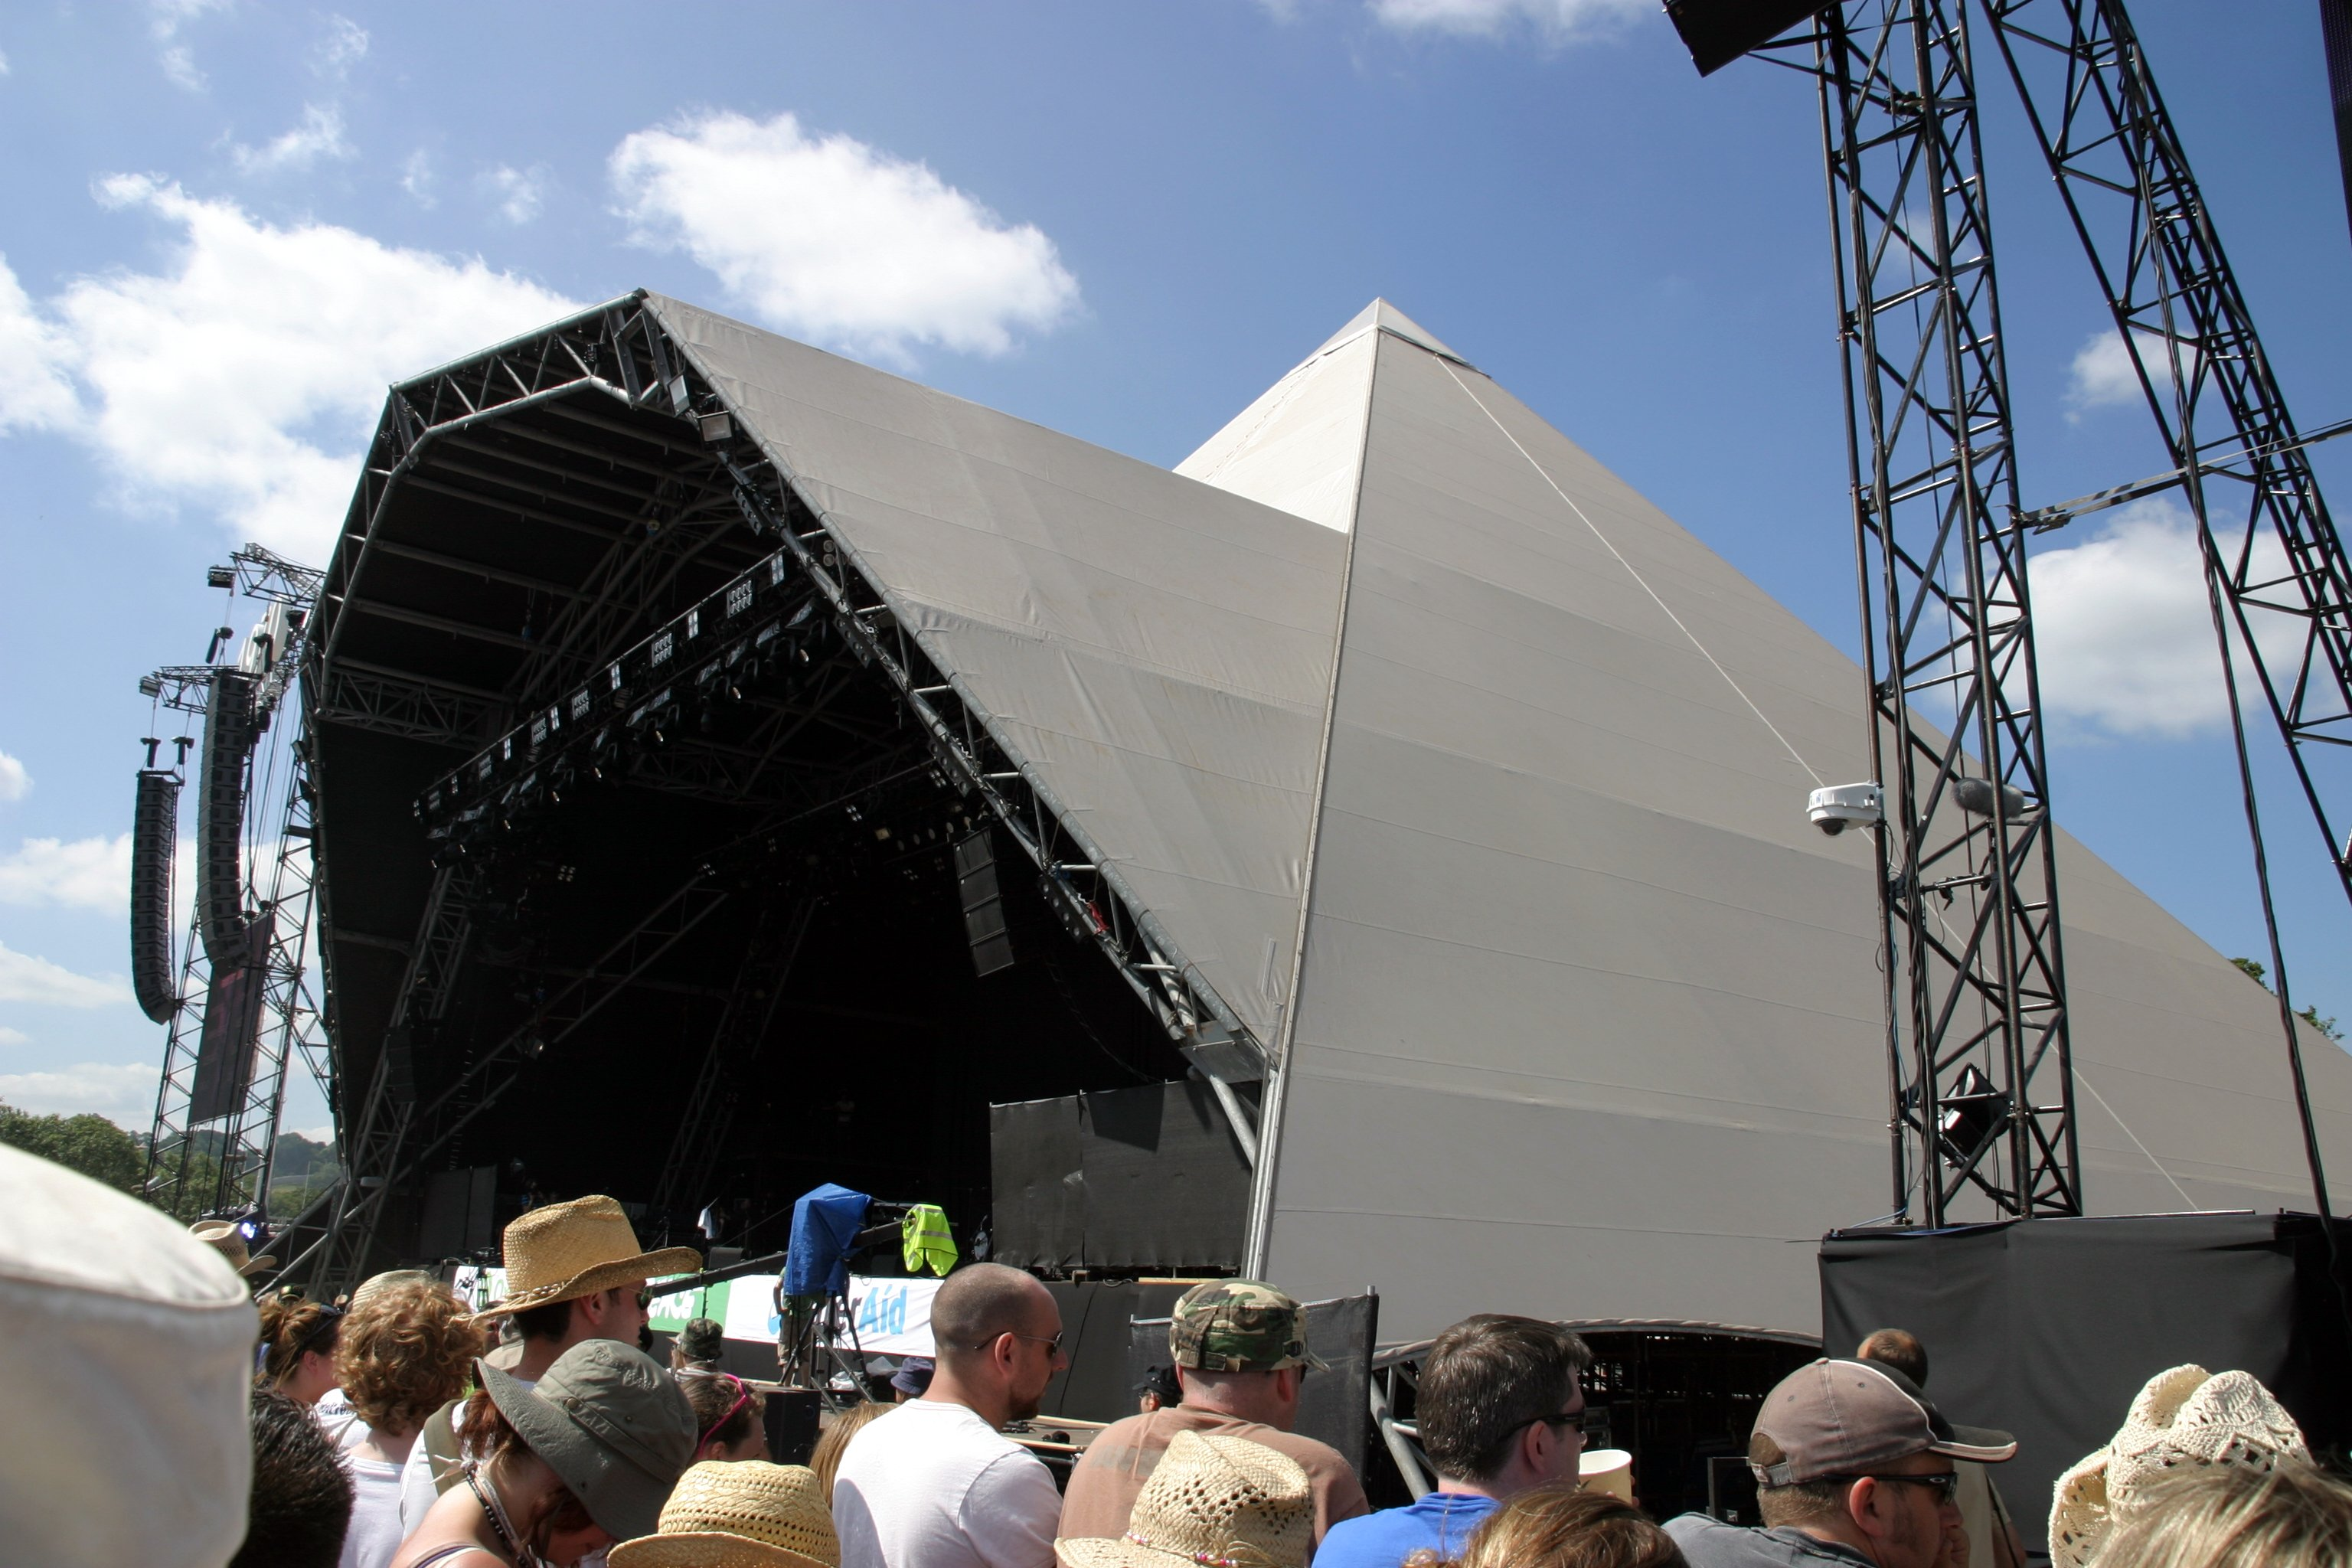 The Pyramid Stage, Glastonbury